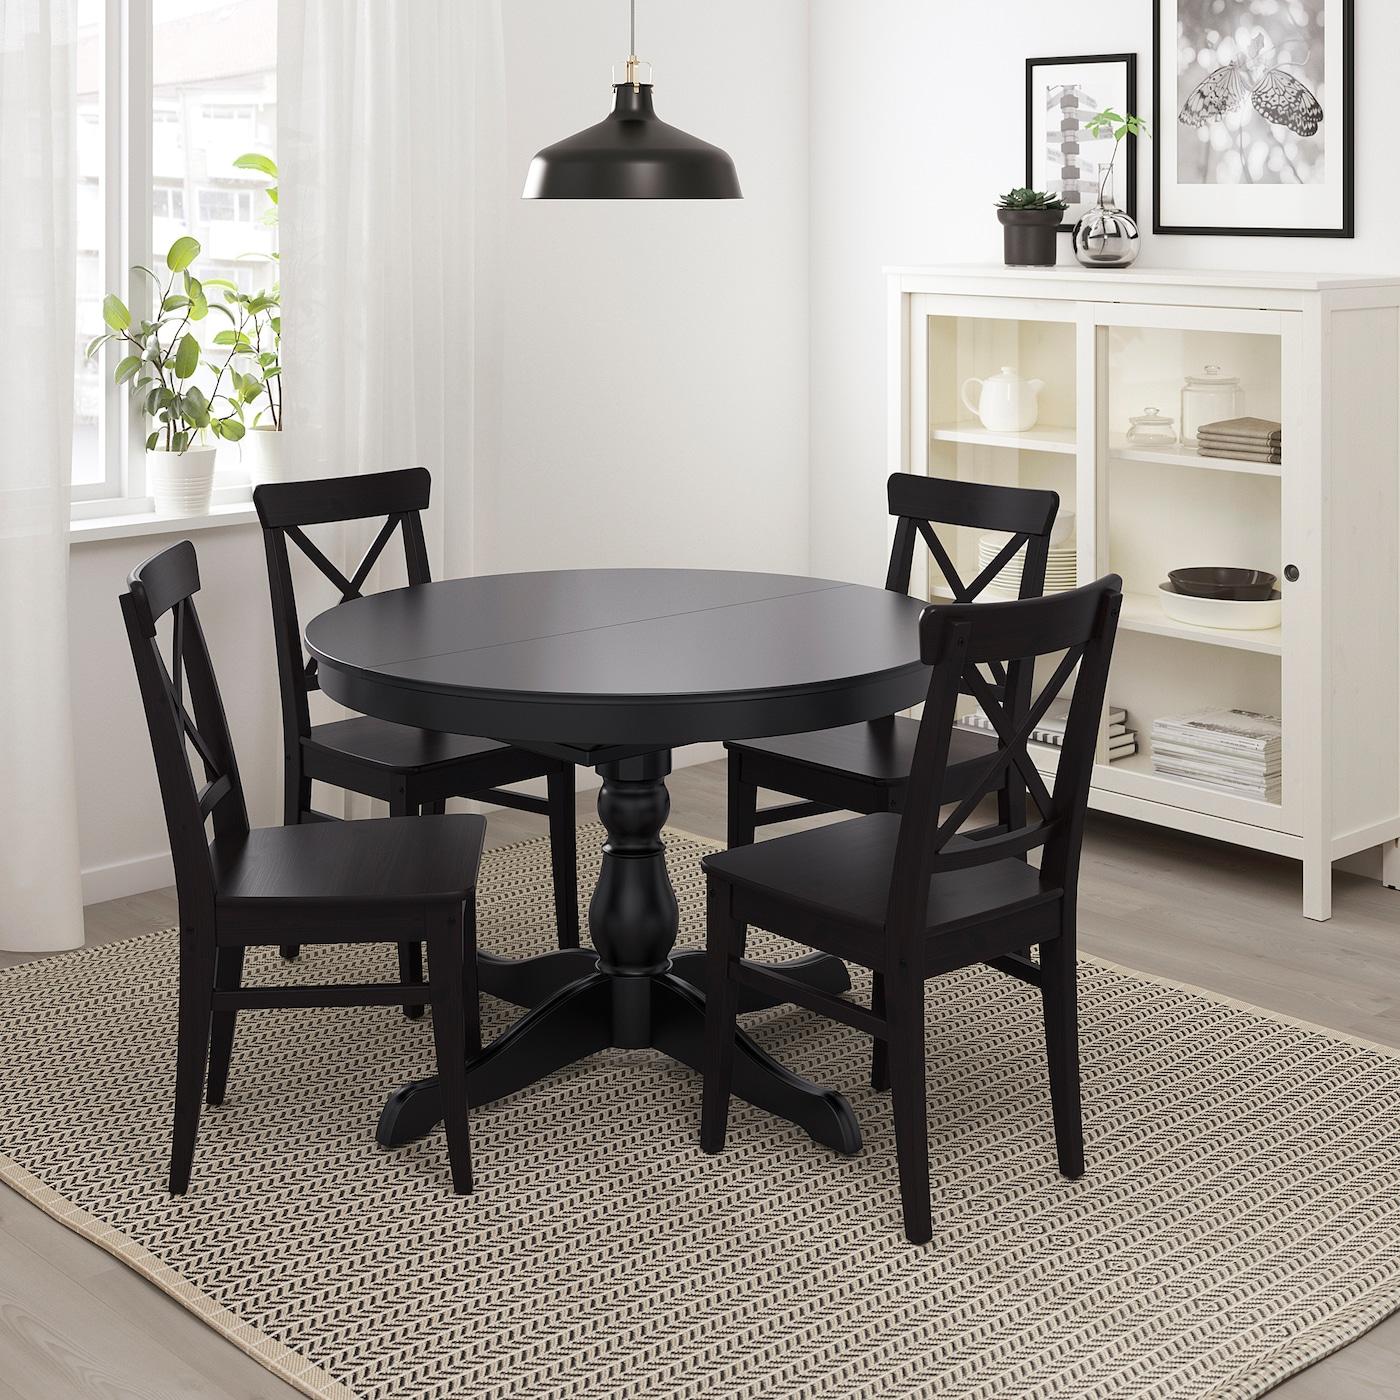 Ingatorp Extendable Table Black Max Length 61 Ikea